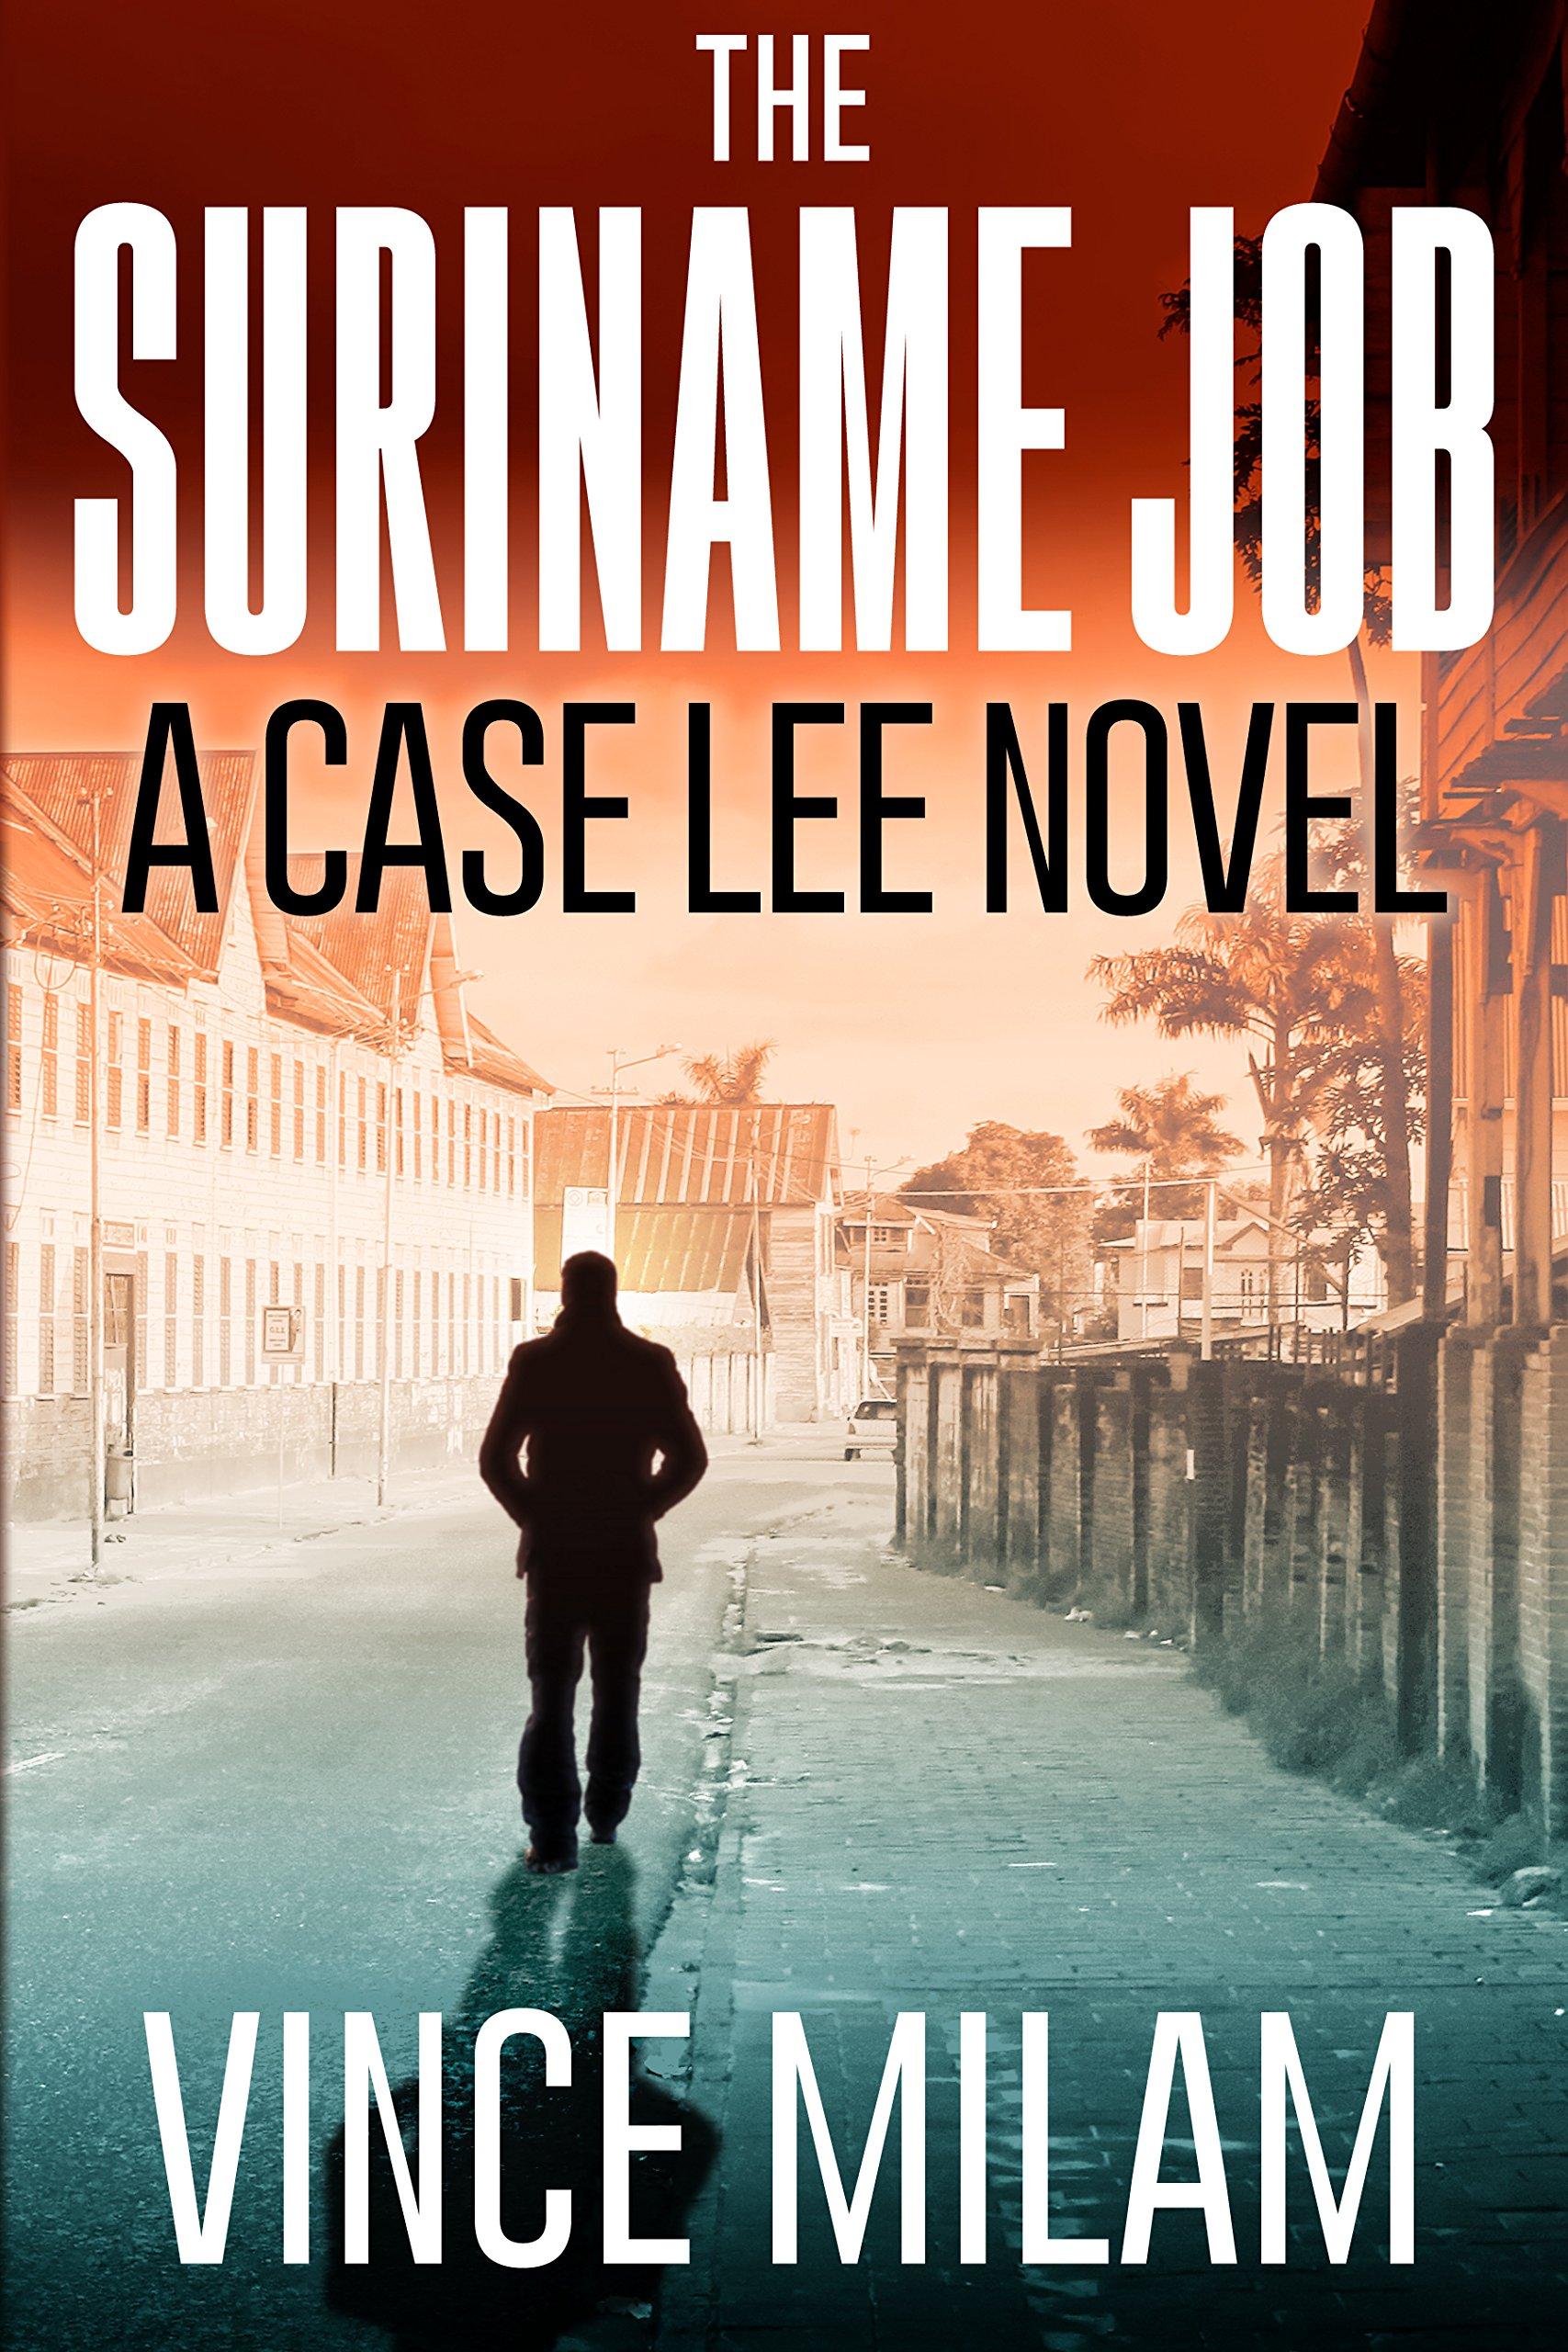 The Suriname Job: A Case Lee Novel (Volume 1)